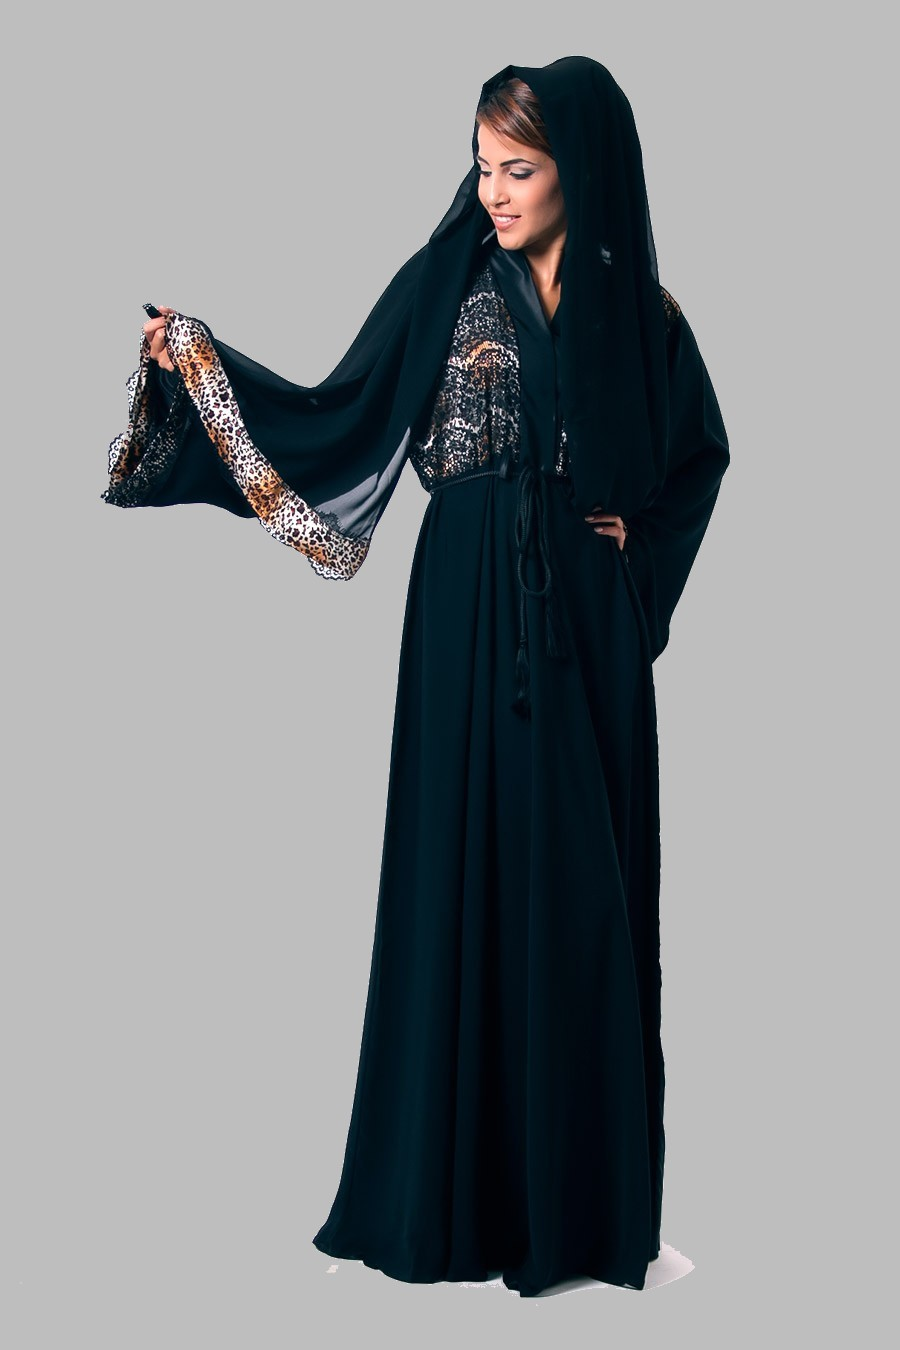 Hijab Dresses Uae Style 6 Busana Muslim Abaya Layla Phasmina Embroidered Designs 2013 Islamic Dress